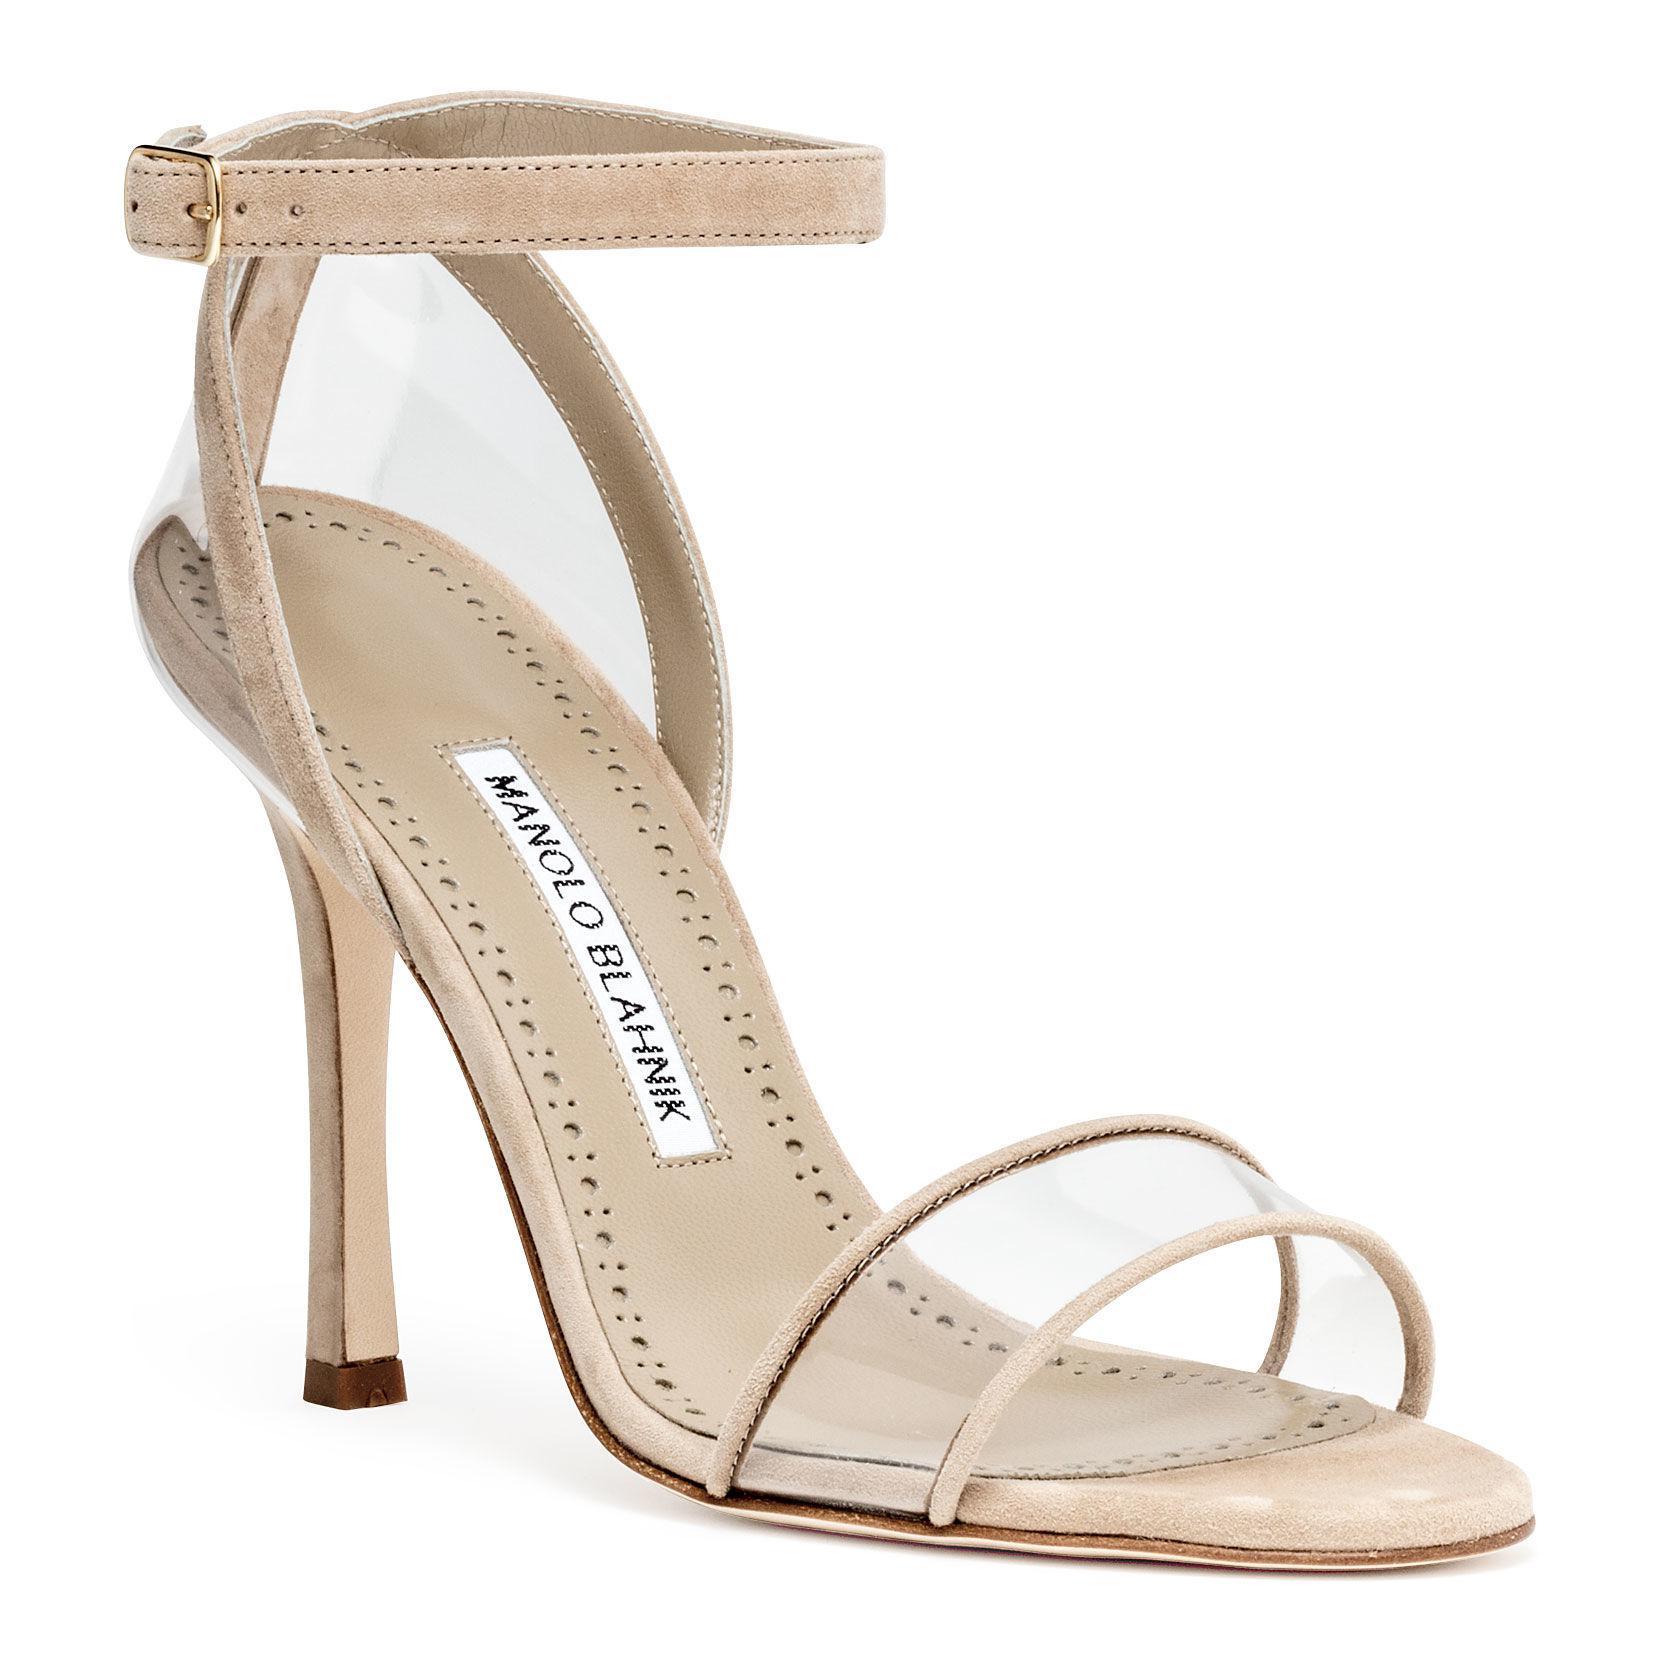 182308cc47a7 Lyst - Manolo Blahnik Dandolo Beige Suede Sandals in Natural